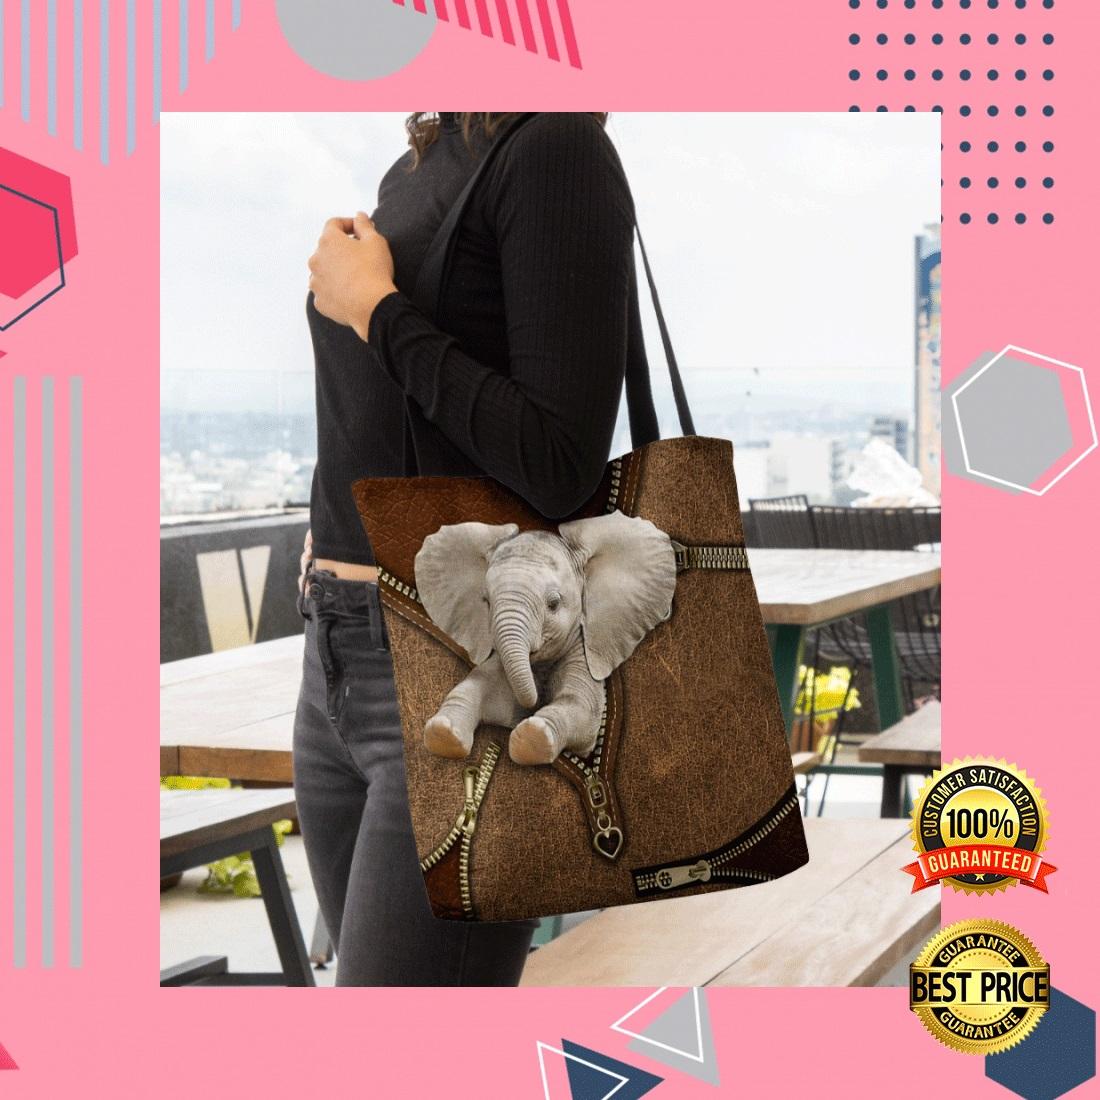 ELEPHANT ZIPPER TOTE BAG 5